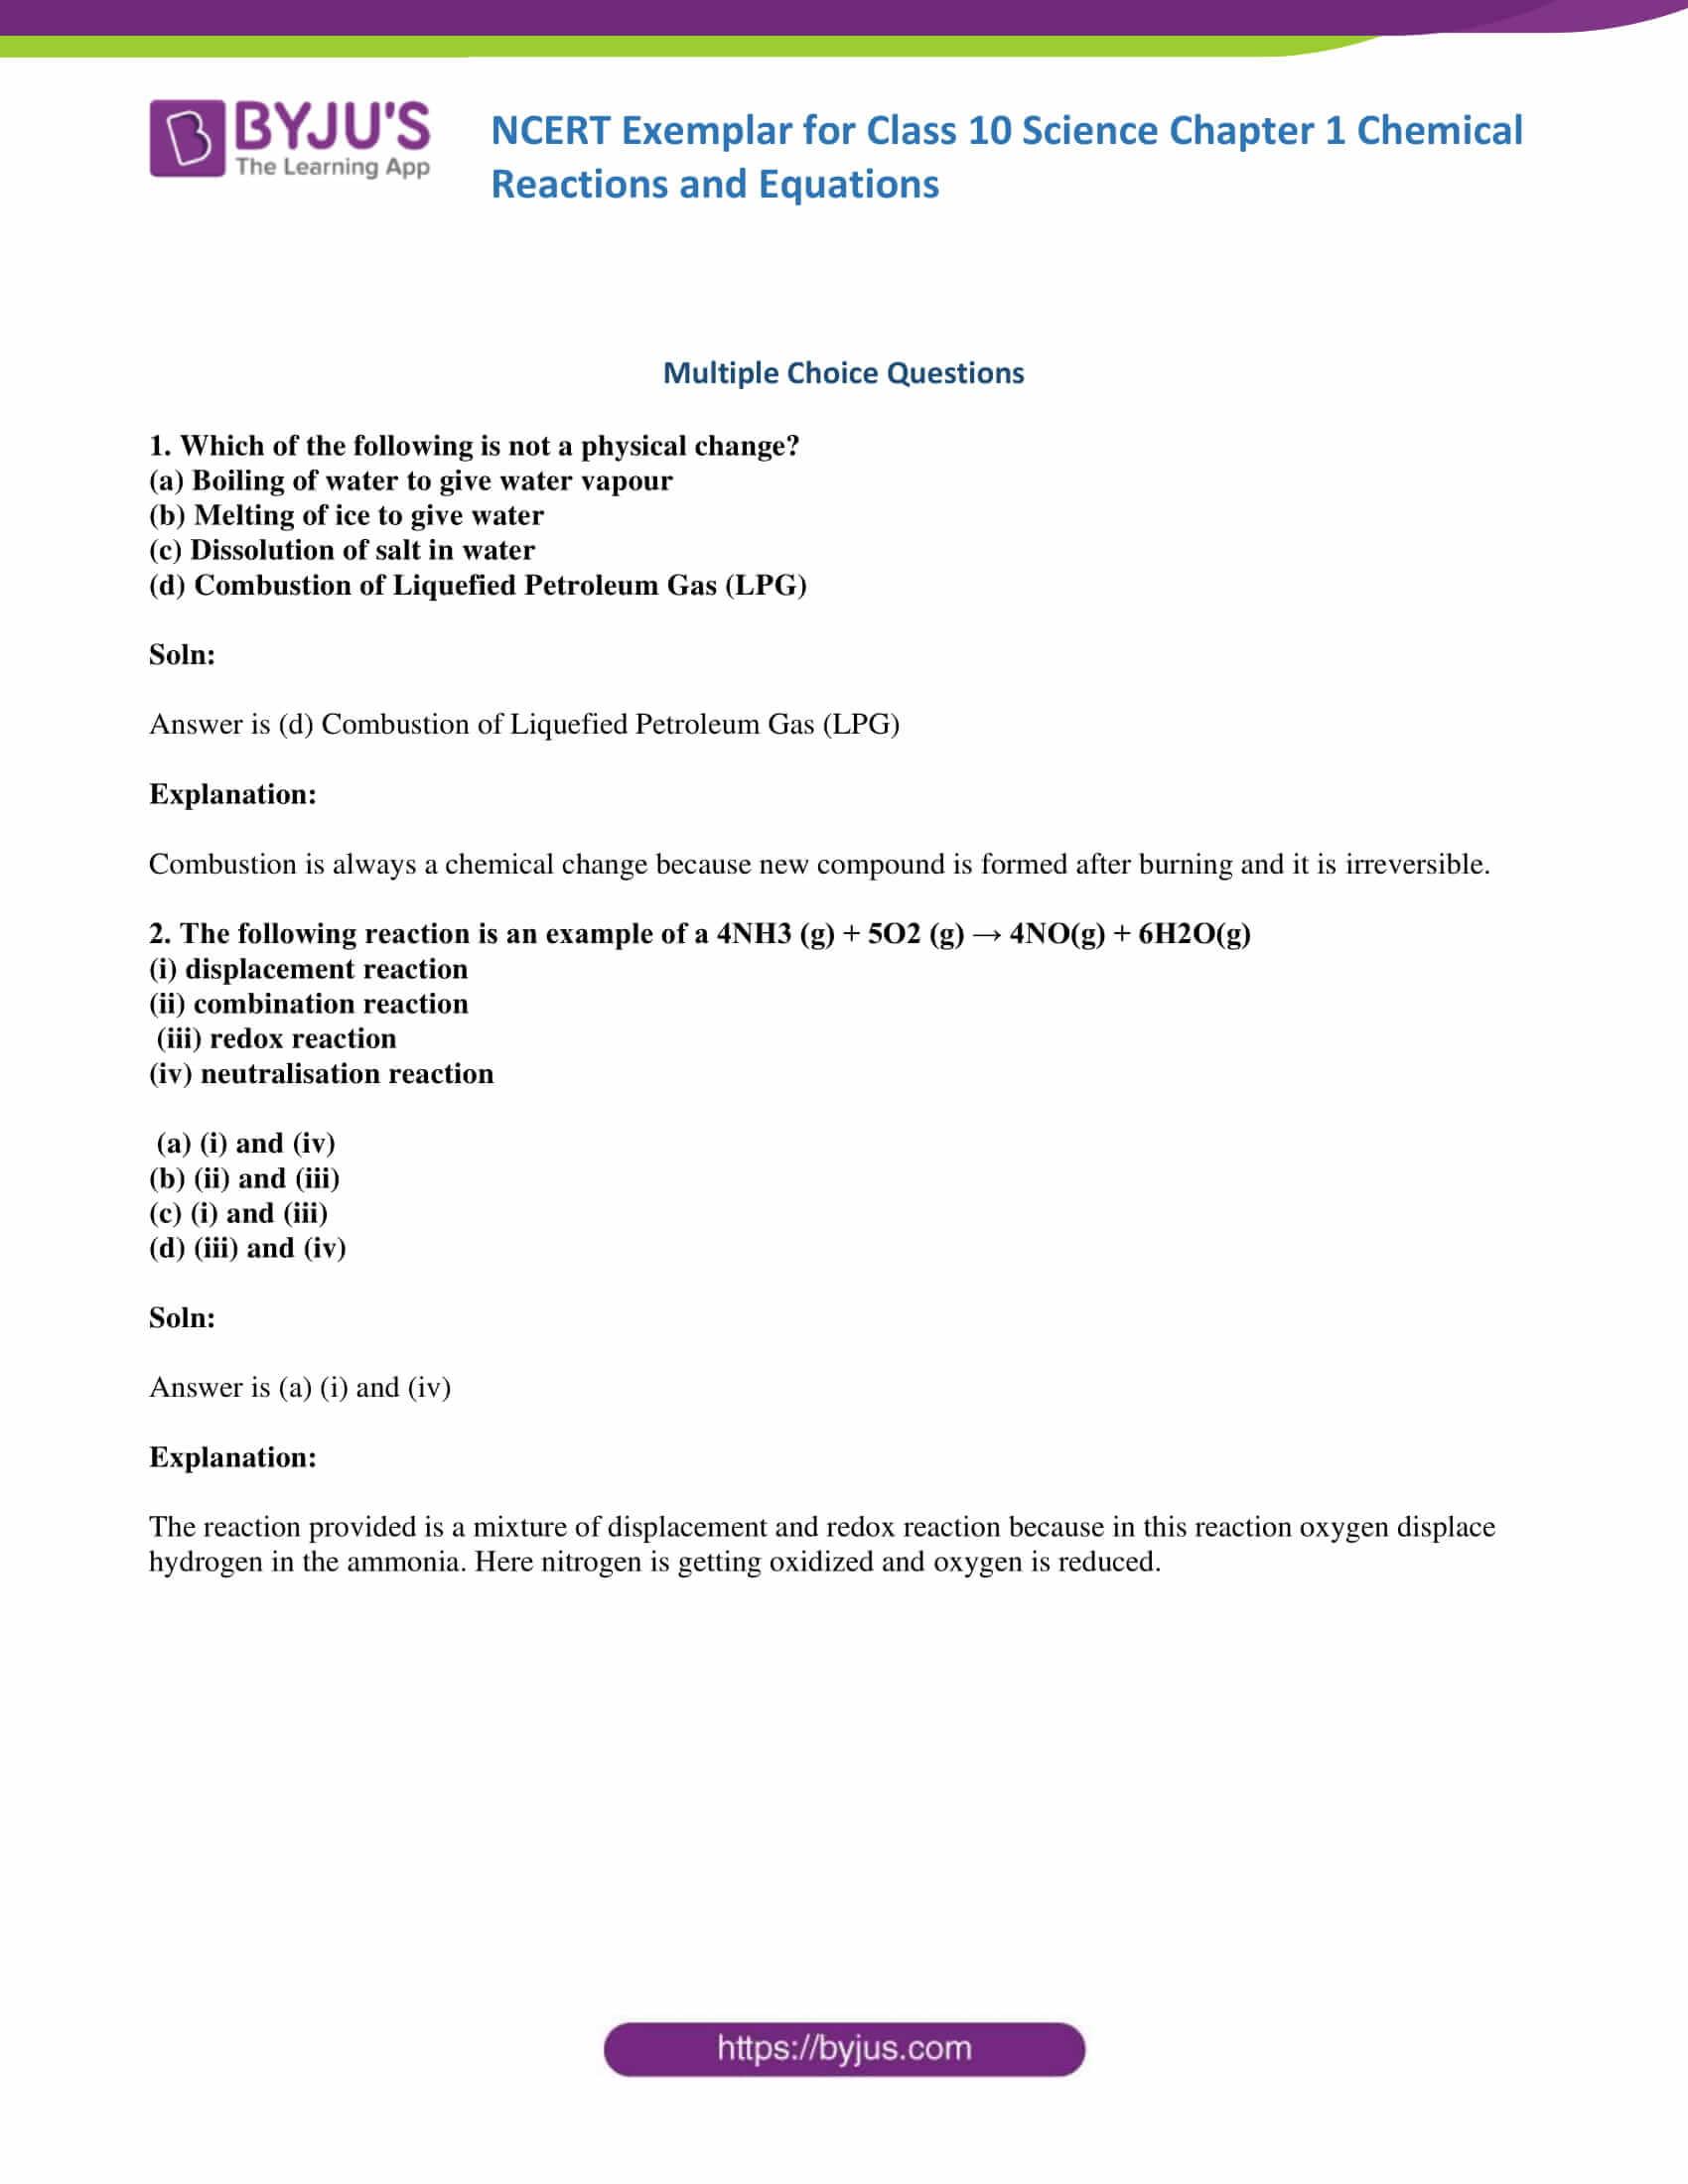 NCERT Exemplar Class 10 Science Solutions Chapter 1